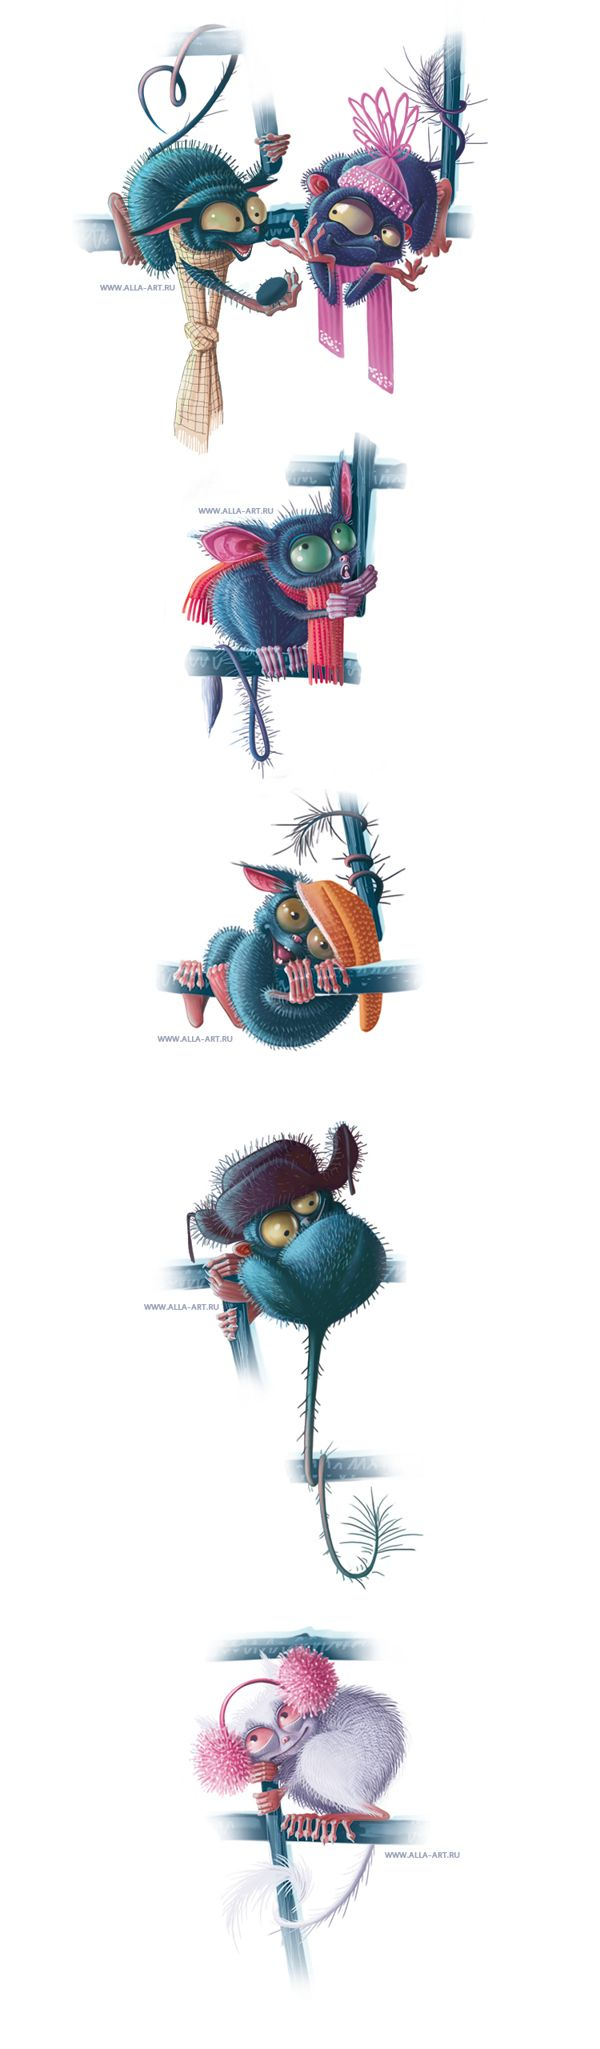 PostCard Characters